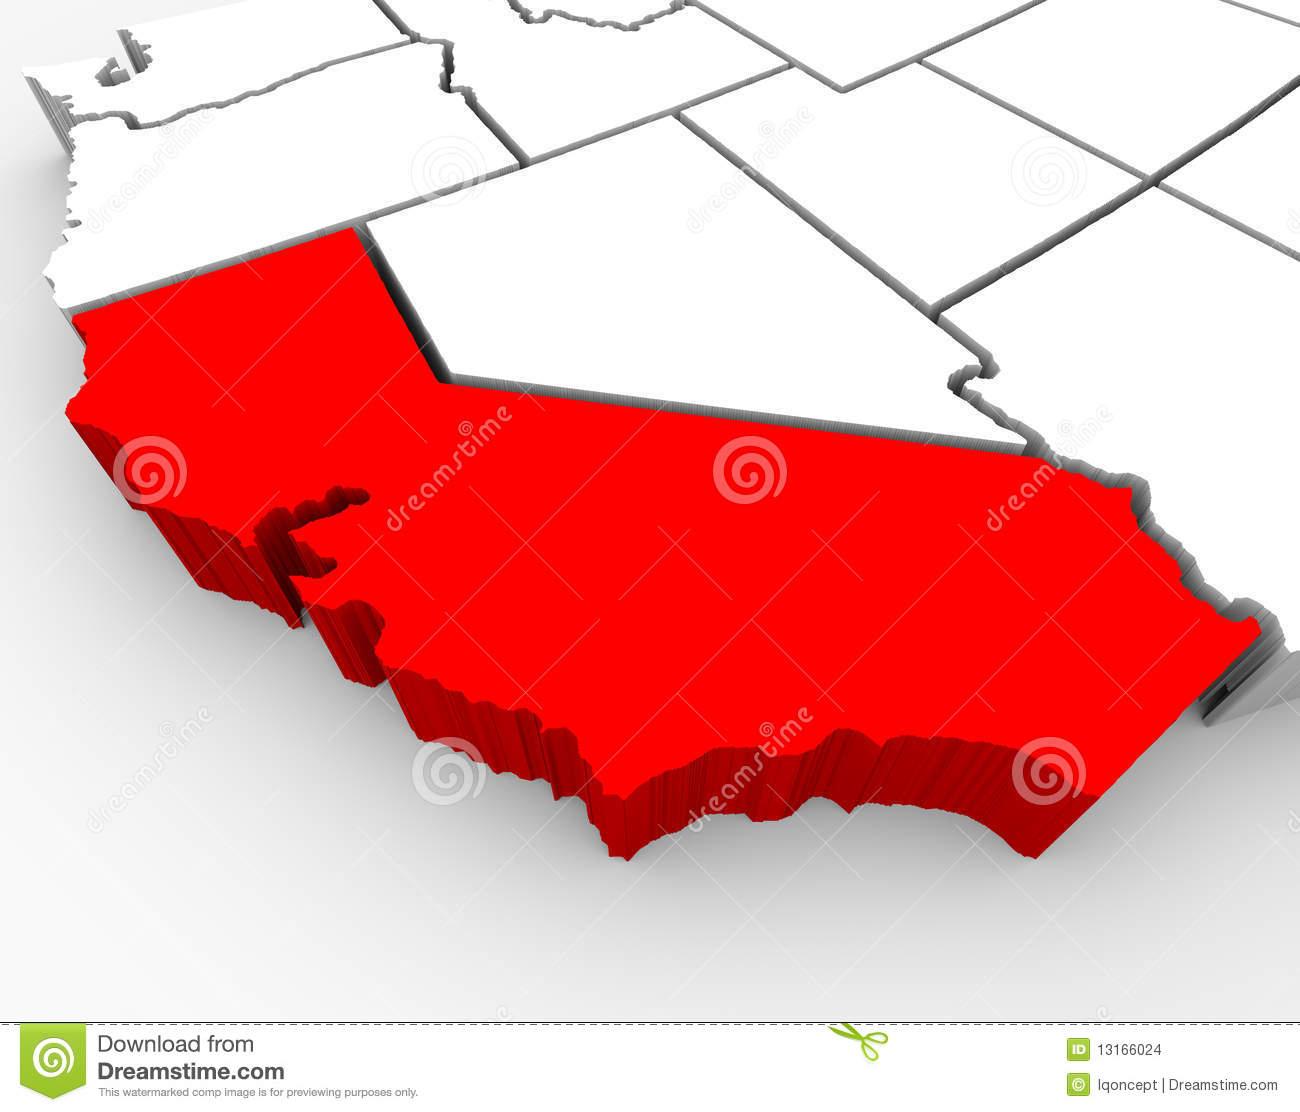 California Sate Map - 3D Illustration Stock Illustration - 3D Map Of California